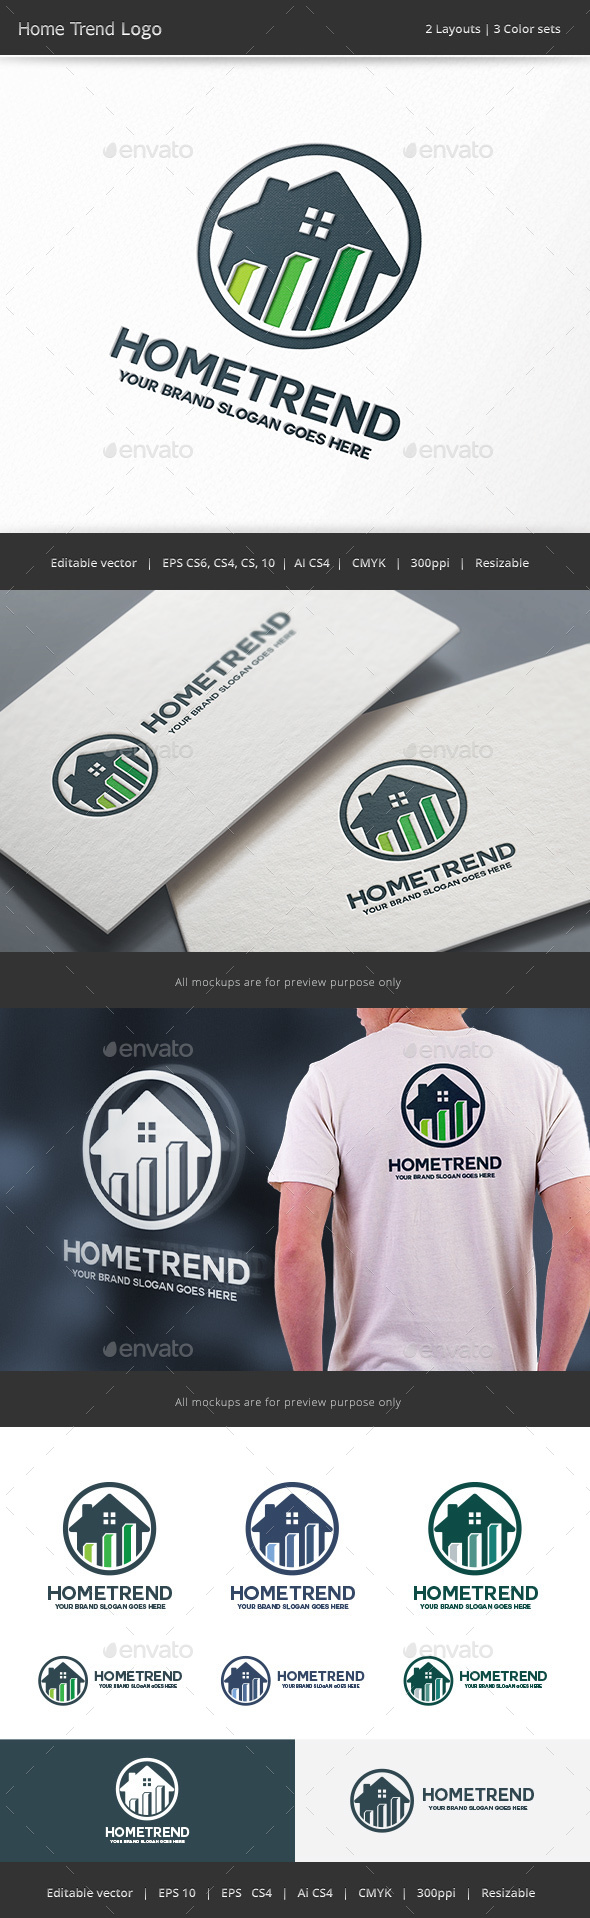 Home Trend Logo - Vector Abstract